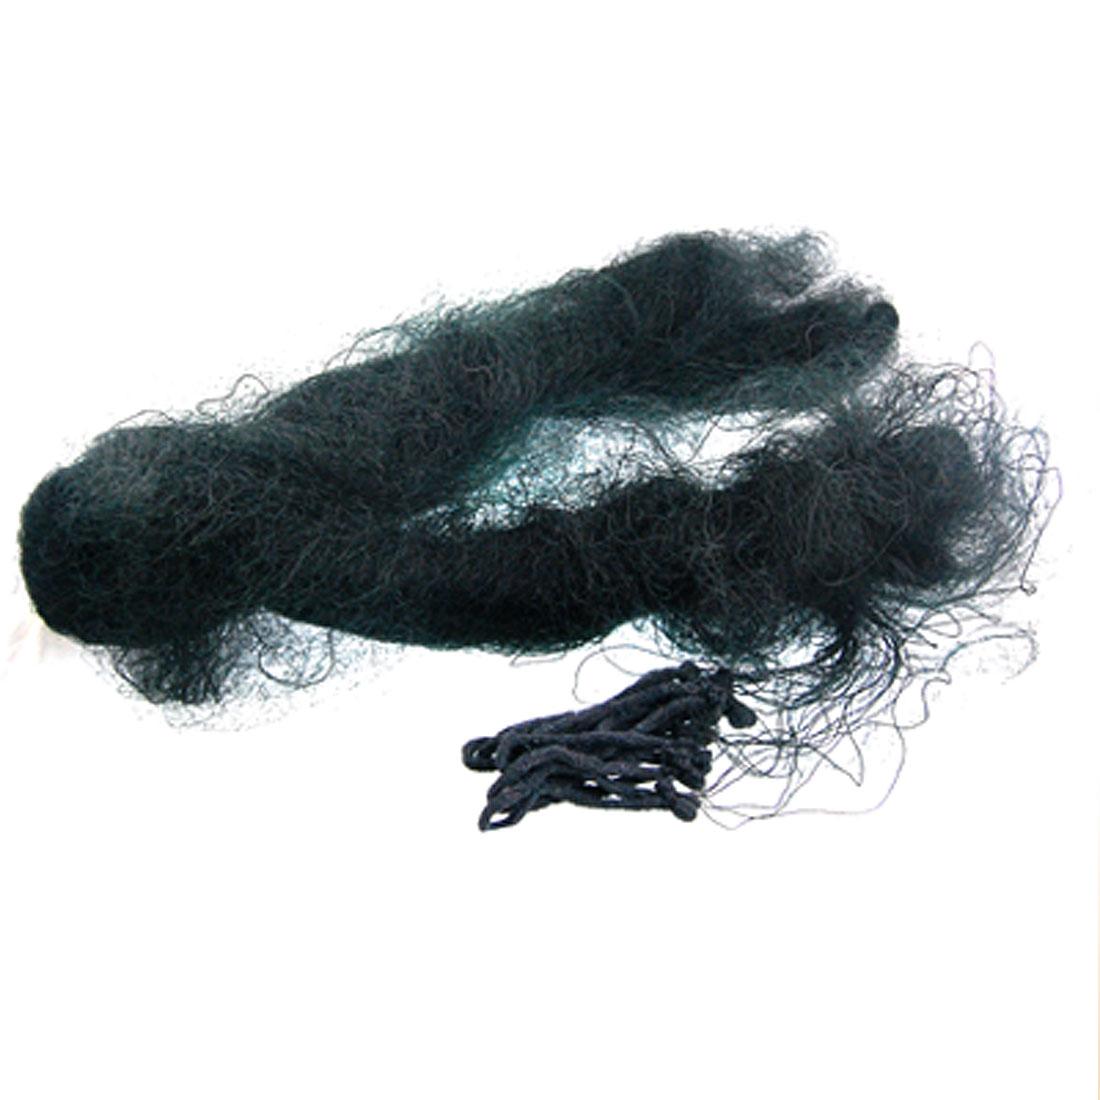 Agricultural 3.8cm x 3.8cm Diamond Mesh Bird Mist Net Mesh Black